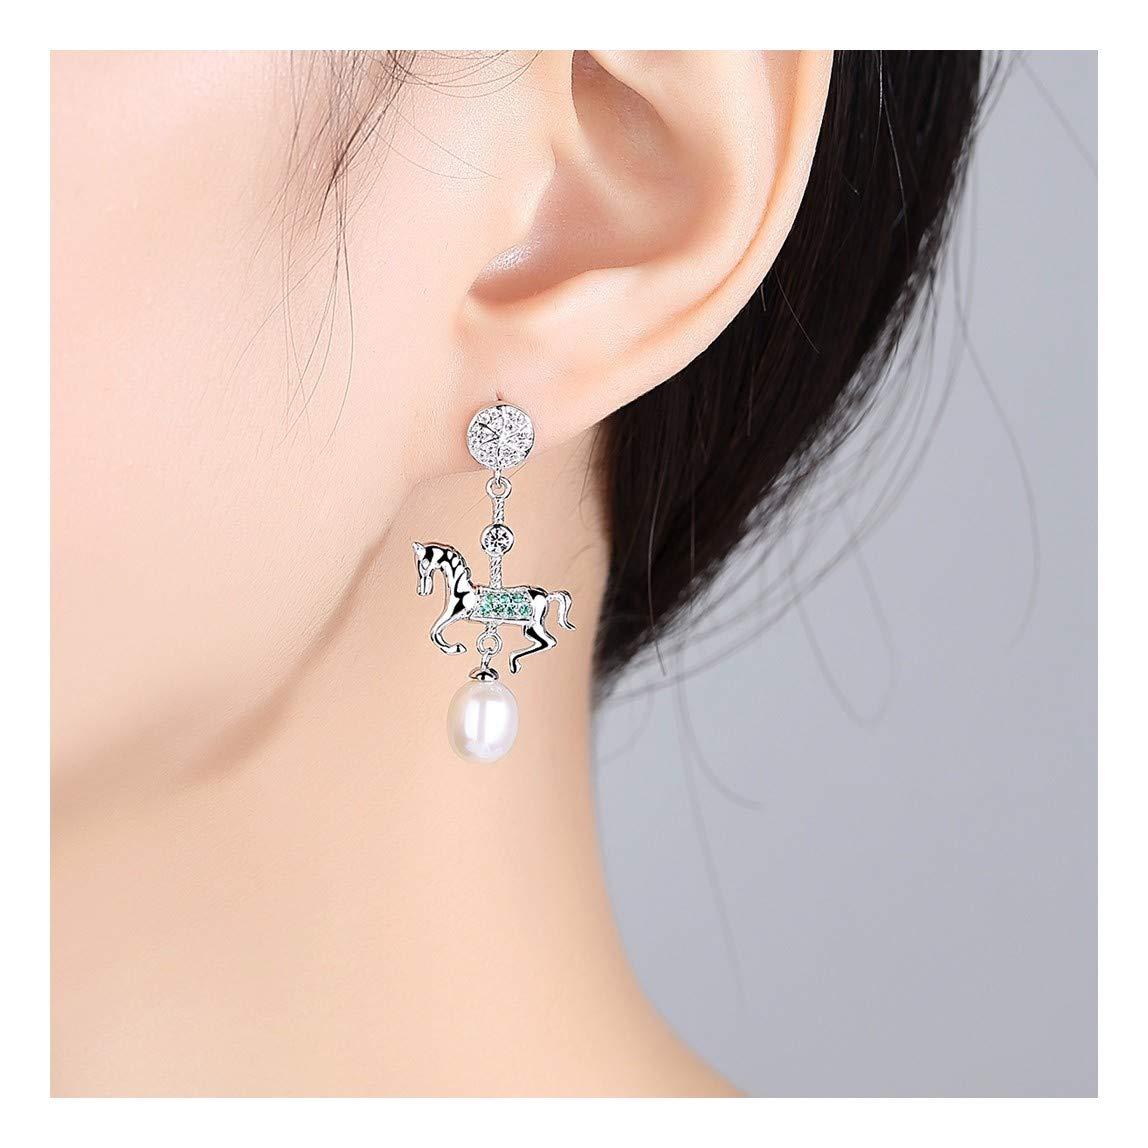 48c81d2135d2 MWTWM Plata Pura Aretes Aretes Nuevos Modelos Rotaciones Natural Patchwork  Diamantes Perlas Ponis Personalidades Joyería Boutique